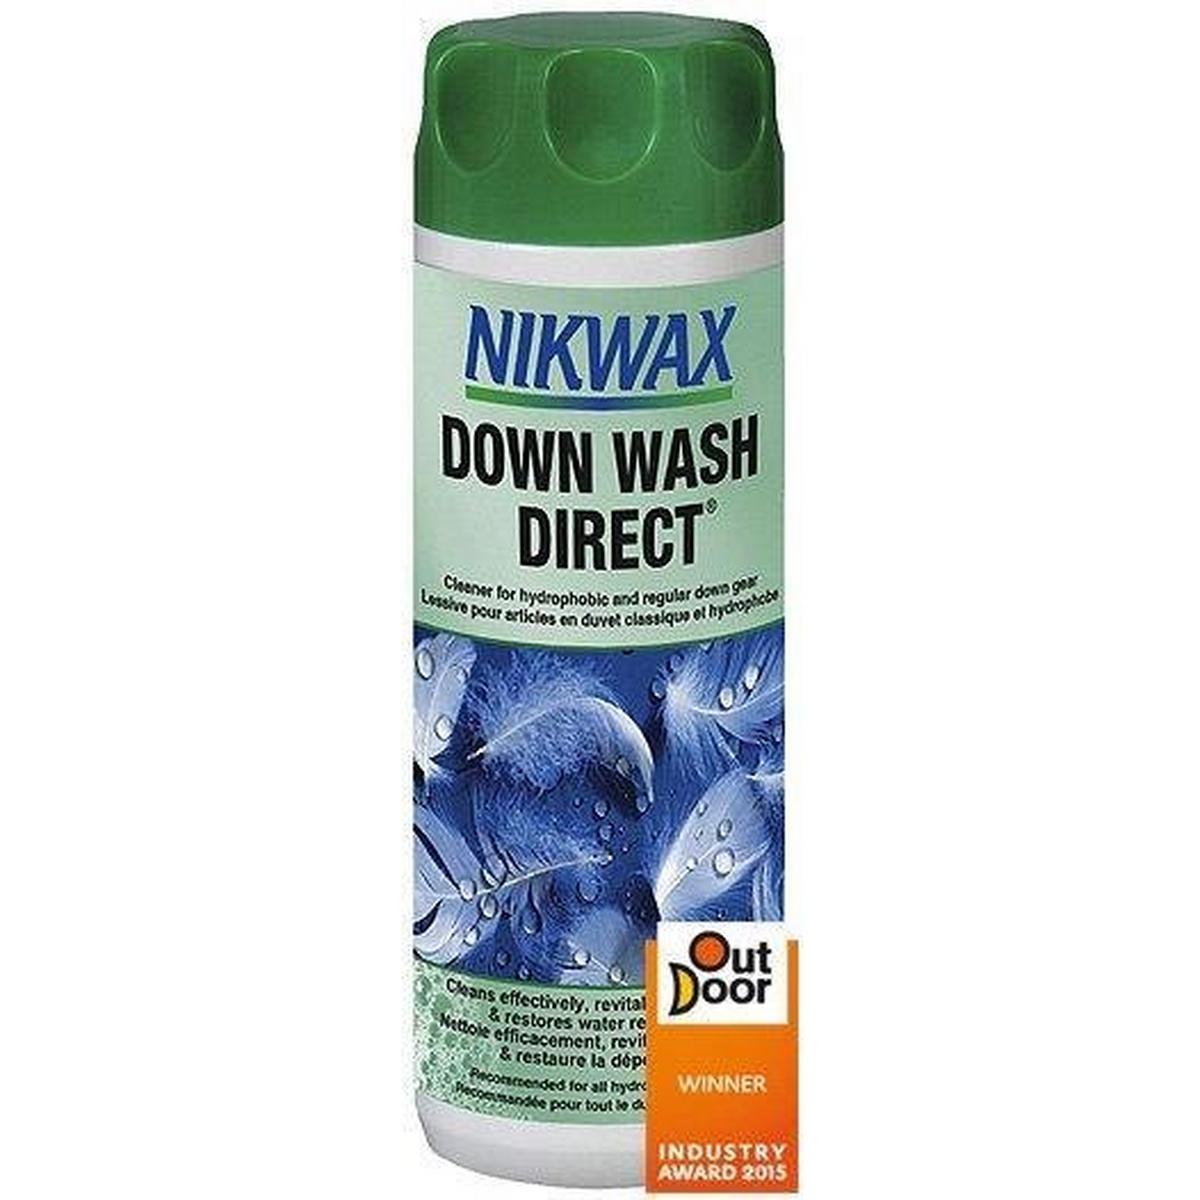 Nikwax Down Wash Direct 300ml